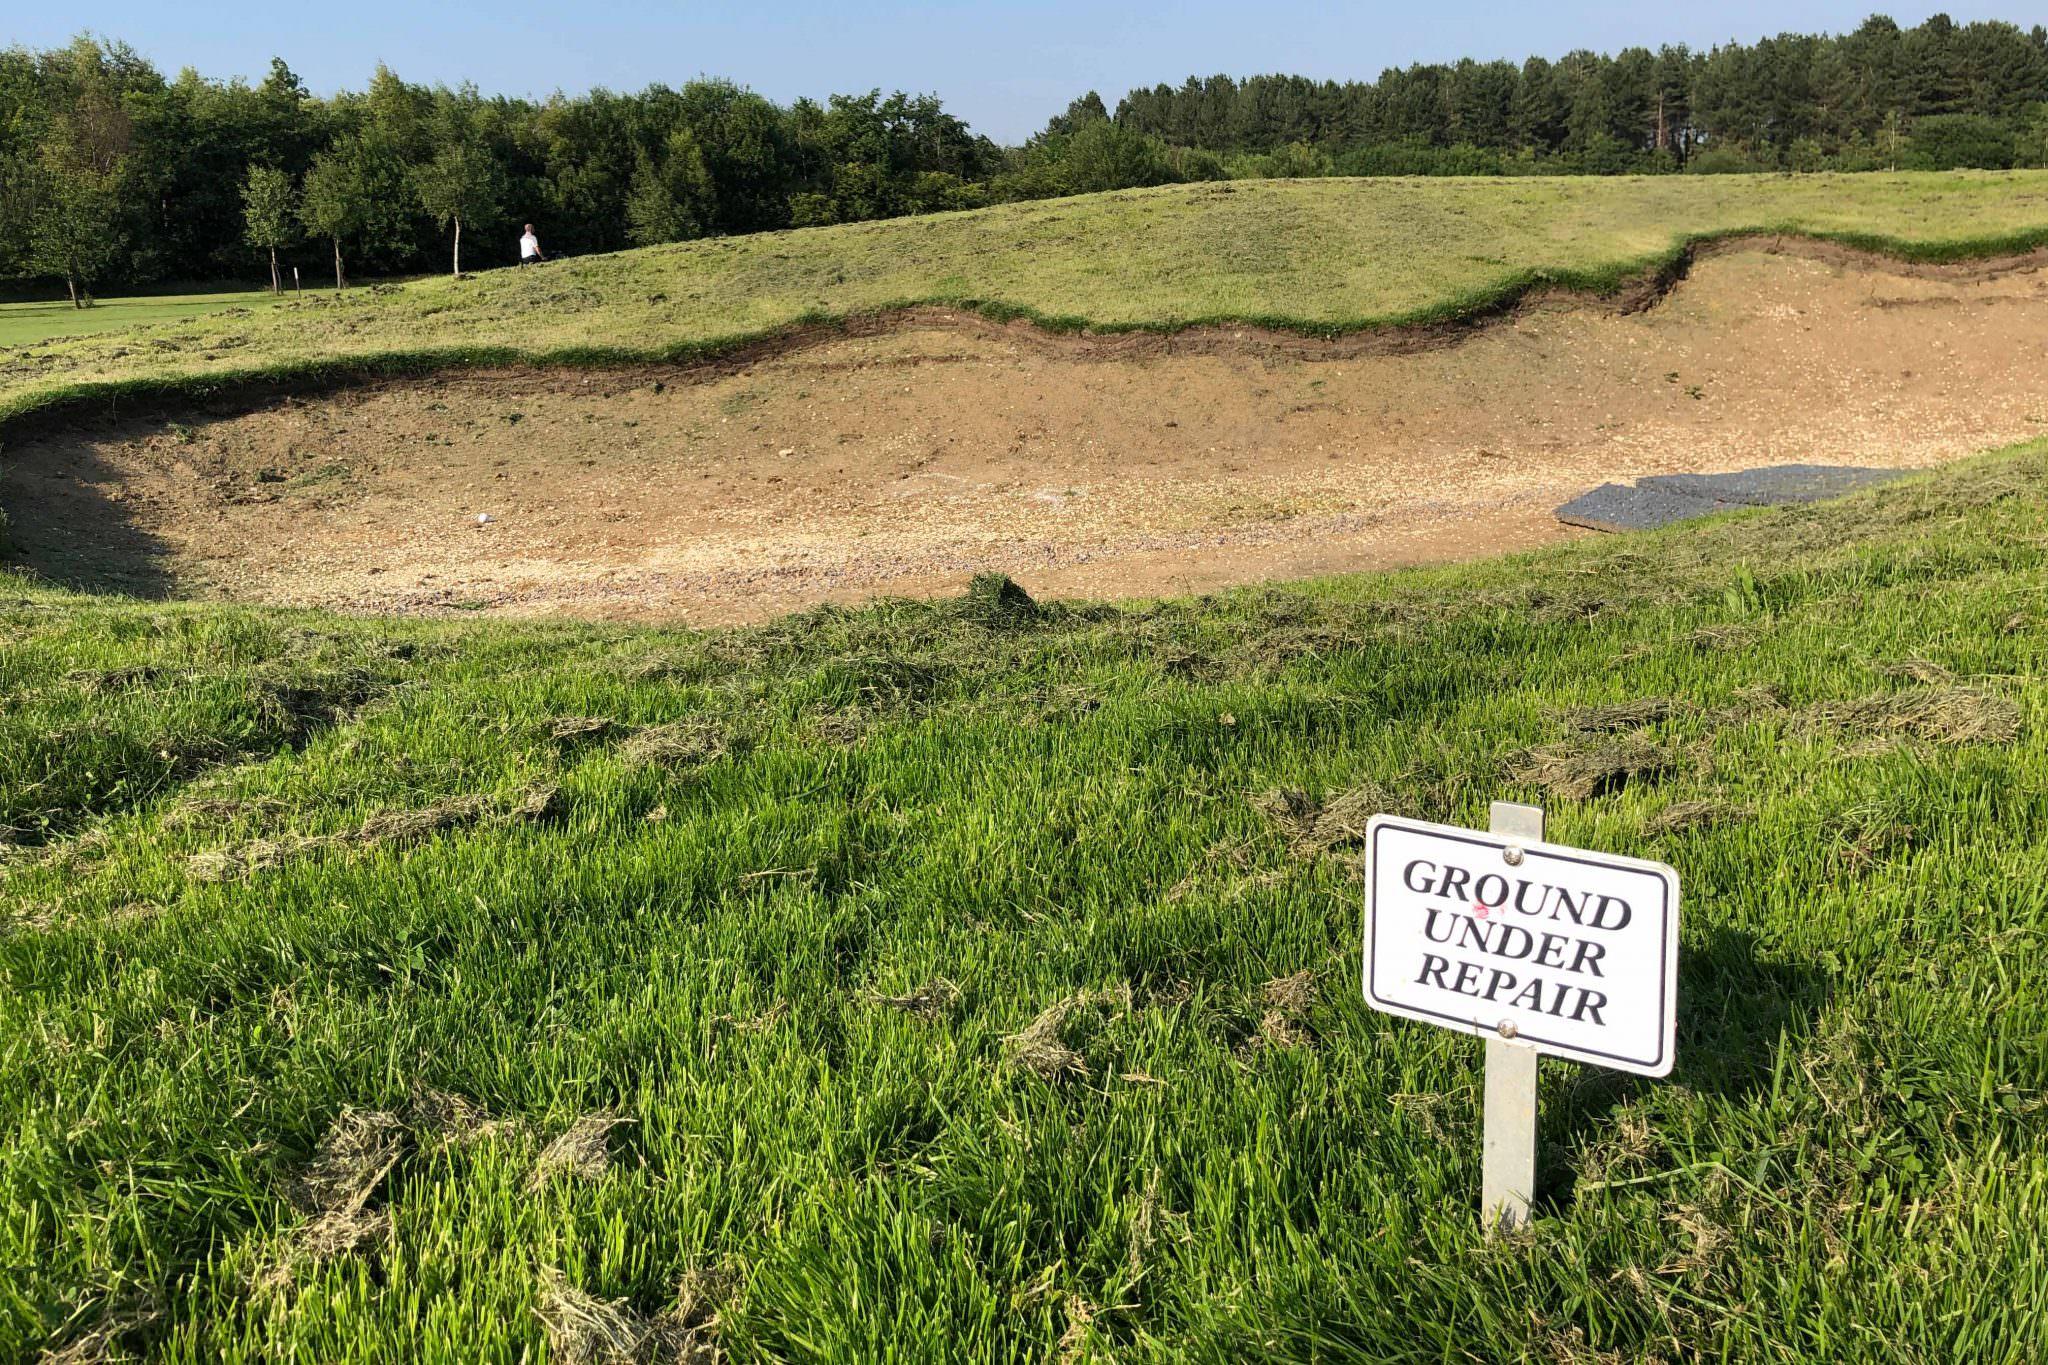 bunkergur | National Club Golfer